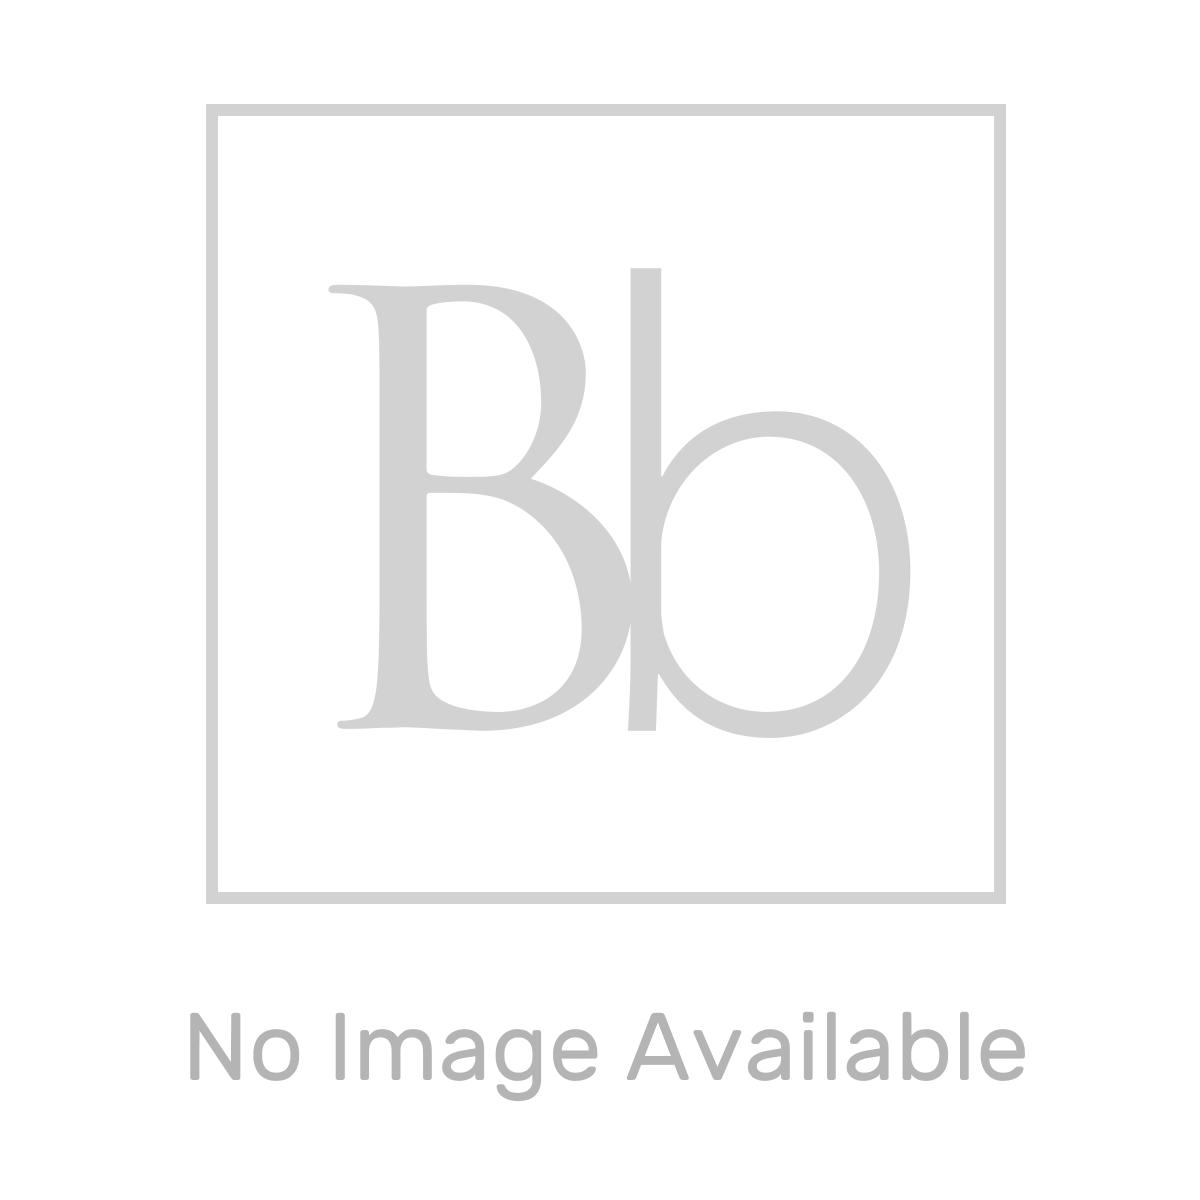 RAK Rubens Illuminated LED Bevel Edged Mirror 600 x 400mm